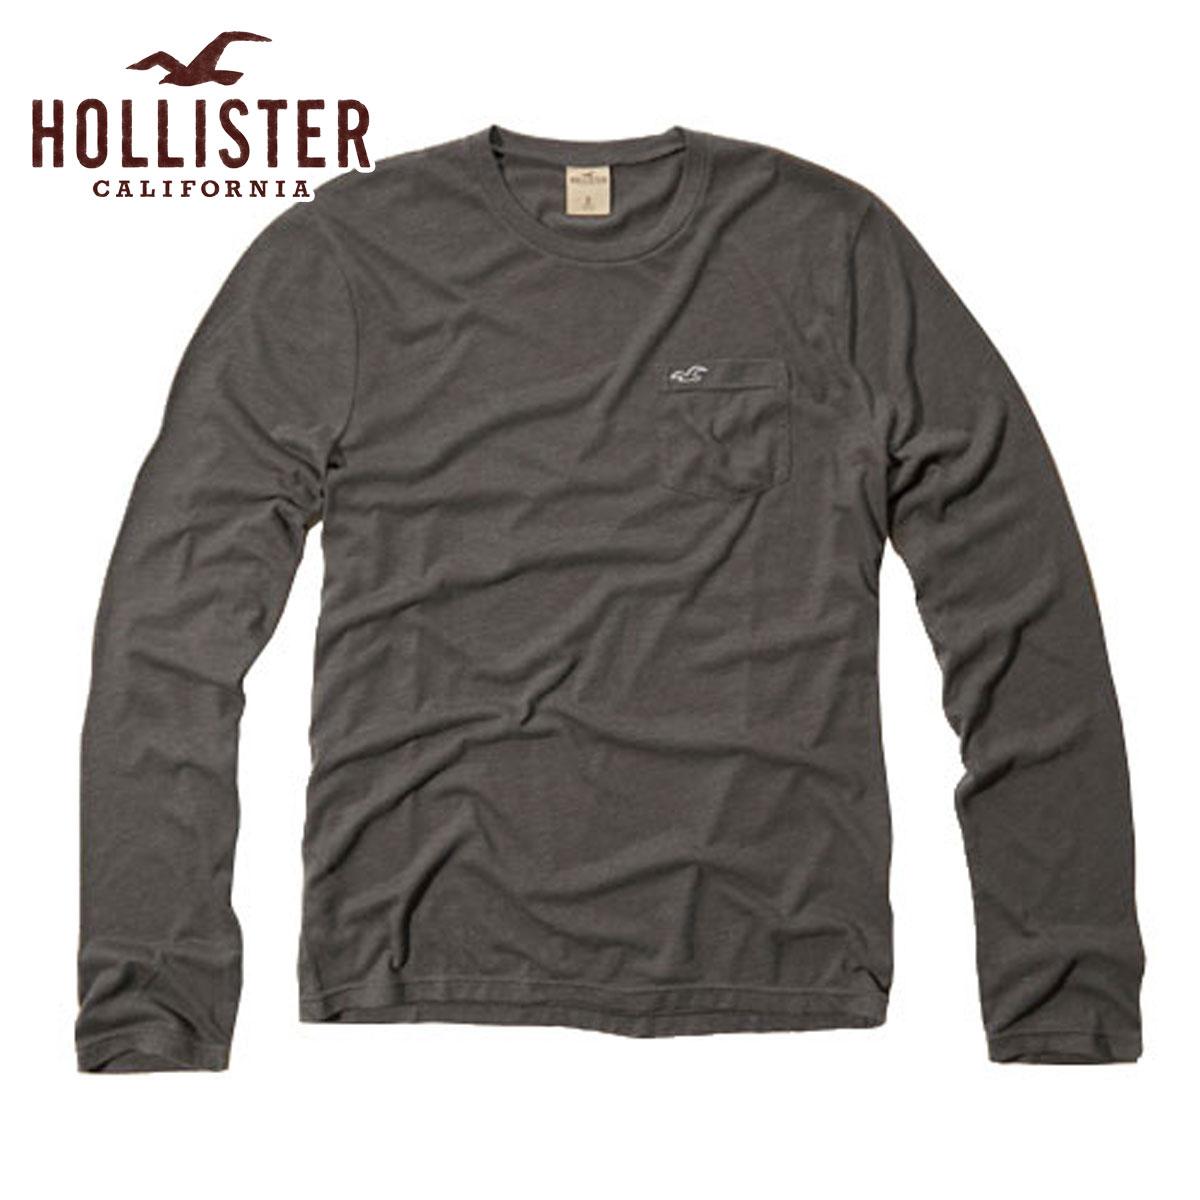 【15%OFFセール 6/26 20:00〜6/30 23:59】 ホリスター HOLLISTER 正規品 メンズ 長袖Tシャツ White Point T-Shirt 324-369-0637-013